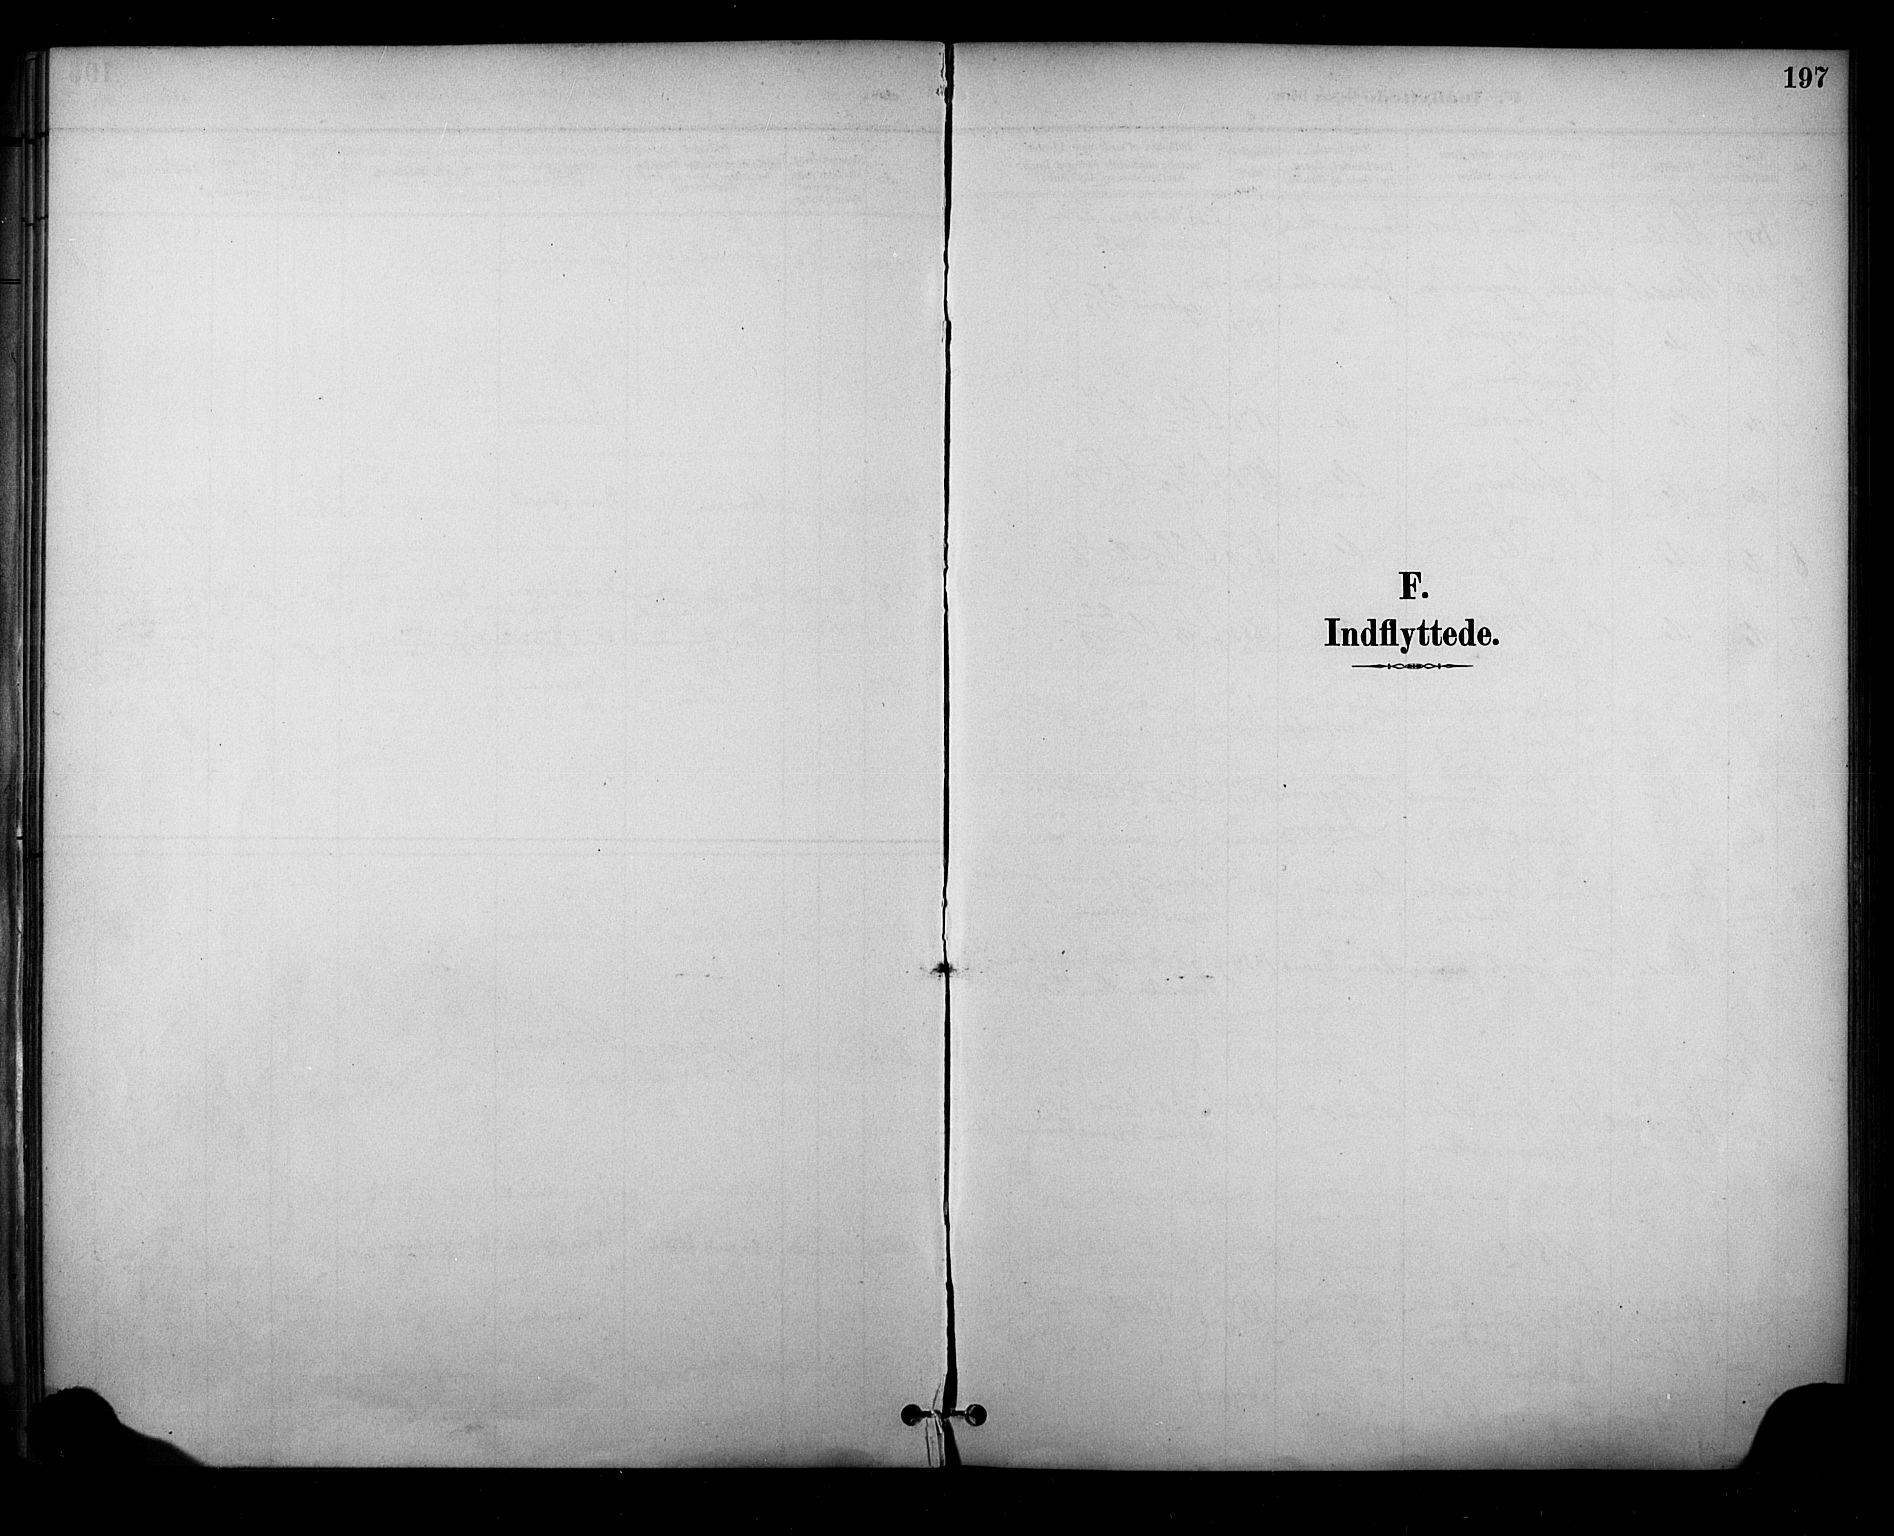 SAKO, Sauherad kirkebøker, F/Fa/L0009: Ministerialbok nr. I 9, 1887-1912, s. 197